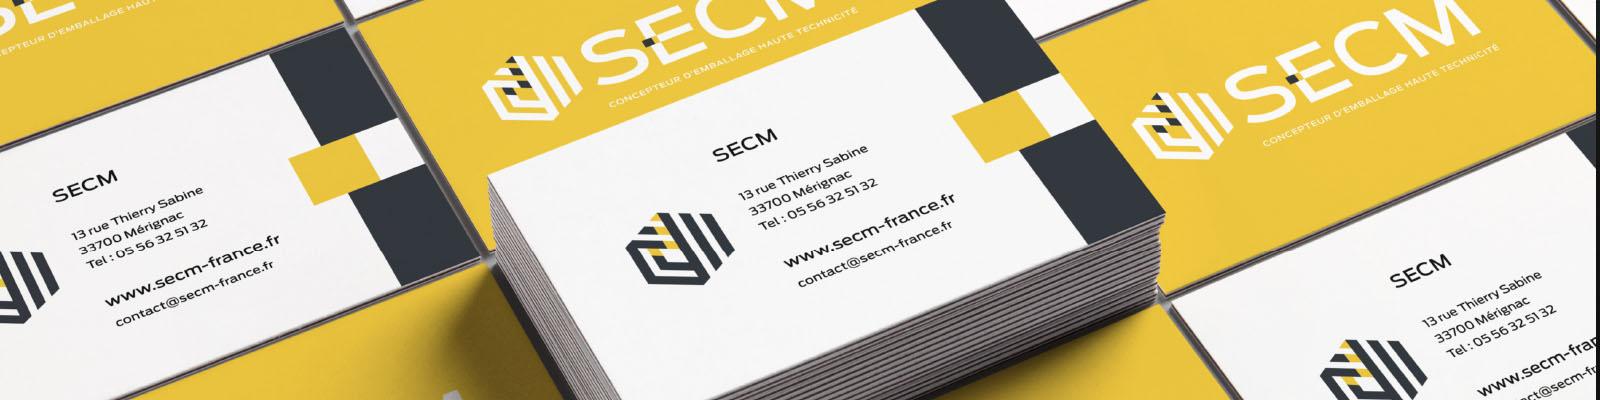 h4-projet-banner-secm-1600x400